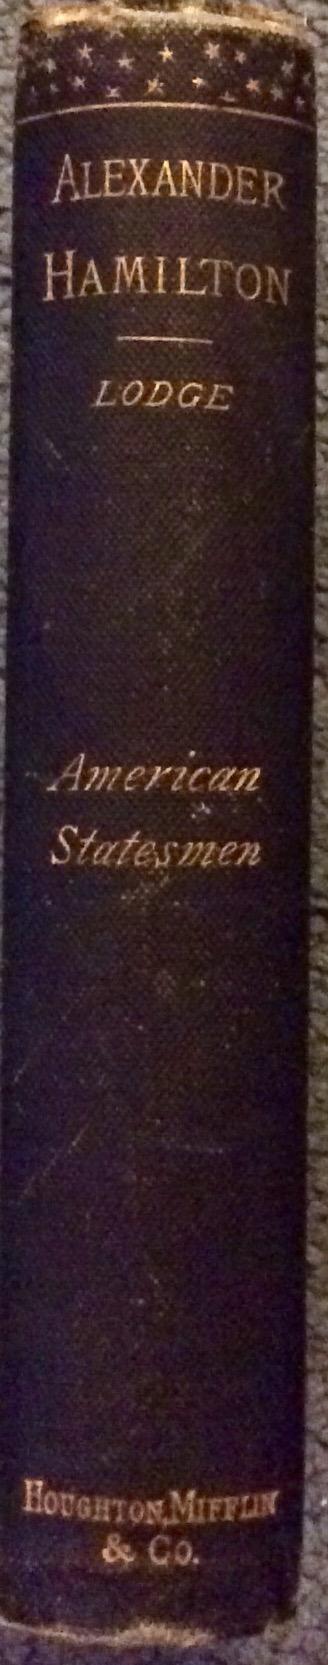 ANTIQUE 1882 HC Biography of Alexander Hamilton